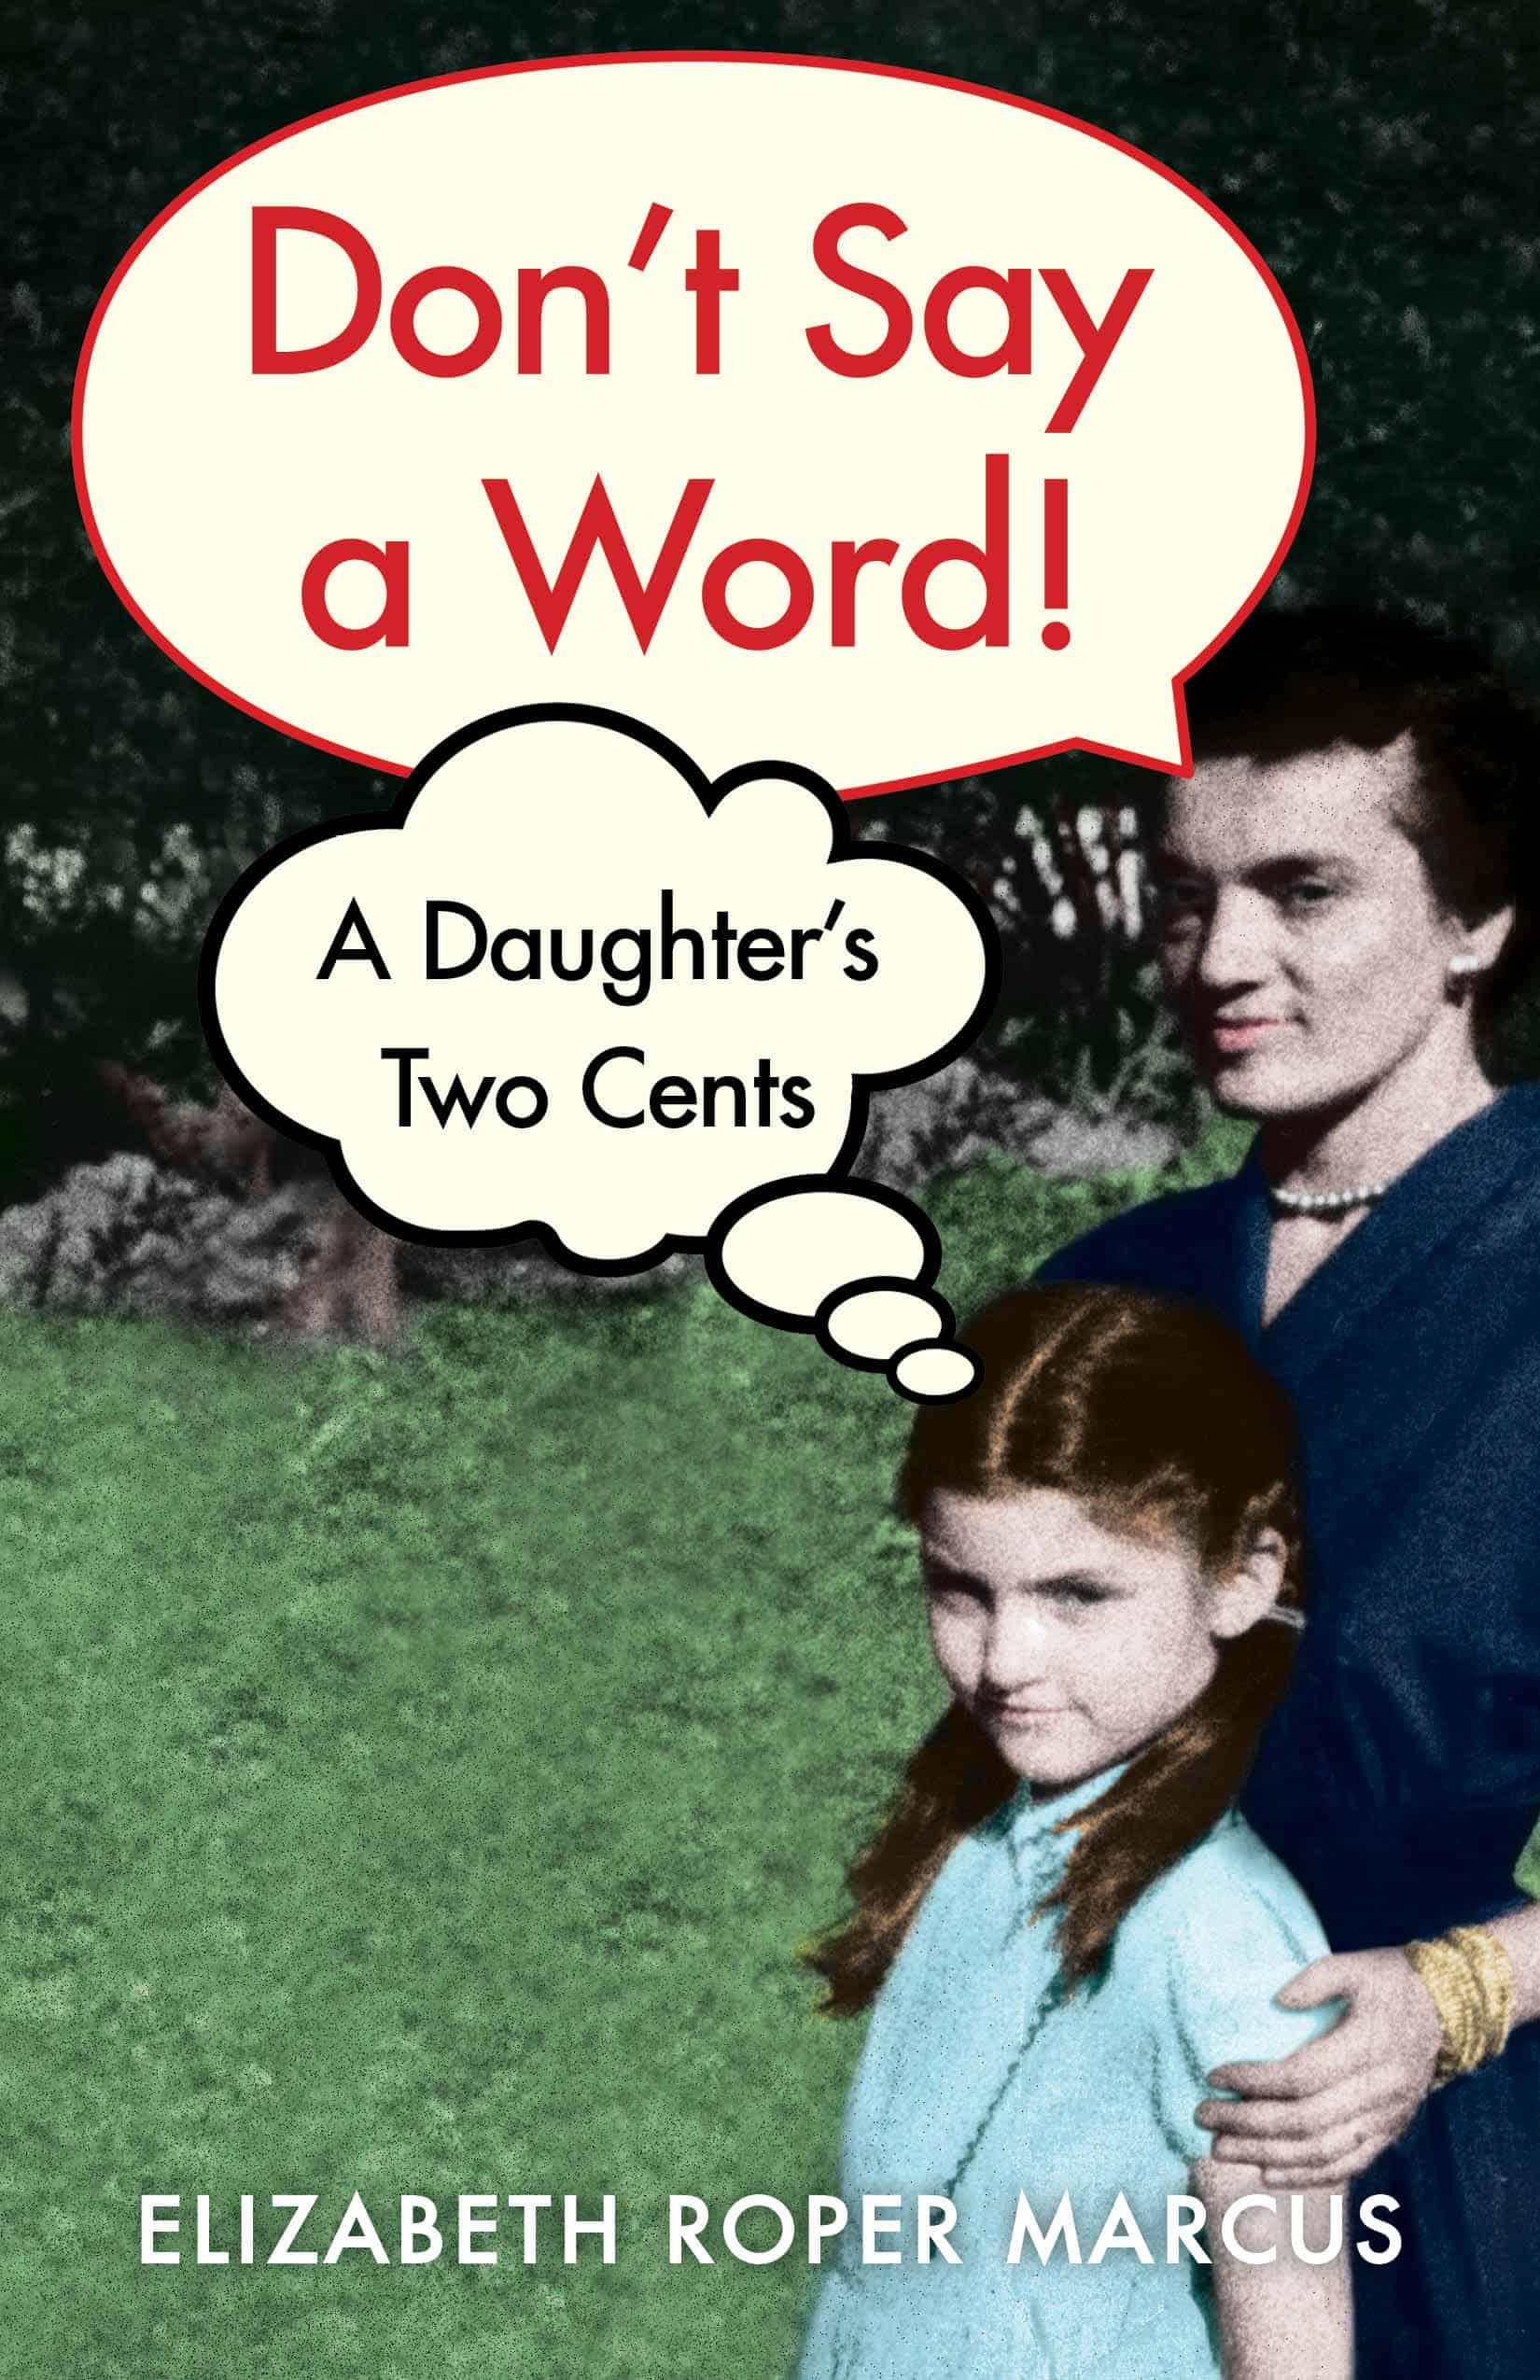 Don't Say a Word by Elizabeth Roper Marcus